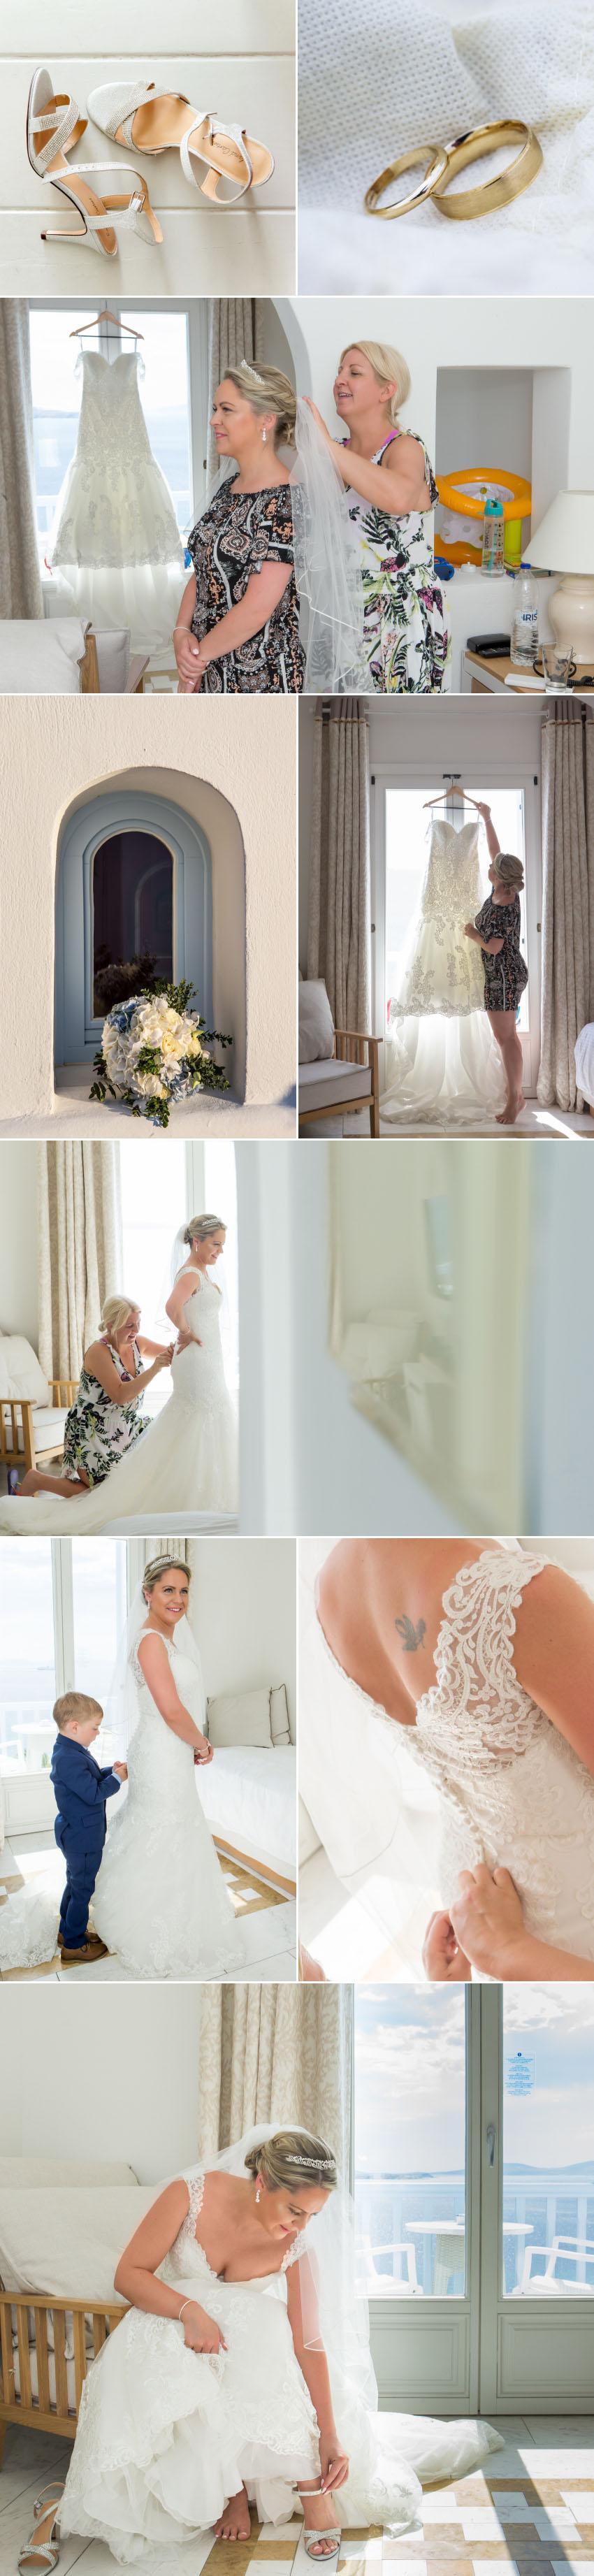 Mykonos Wedding Photography 04